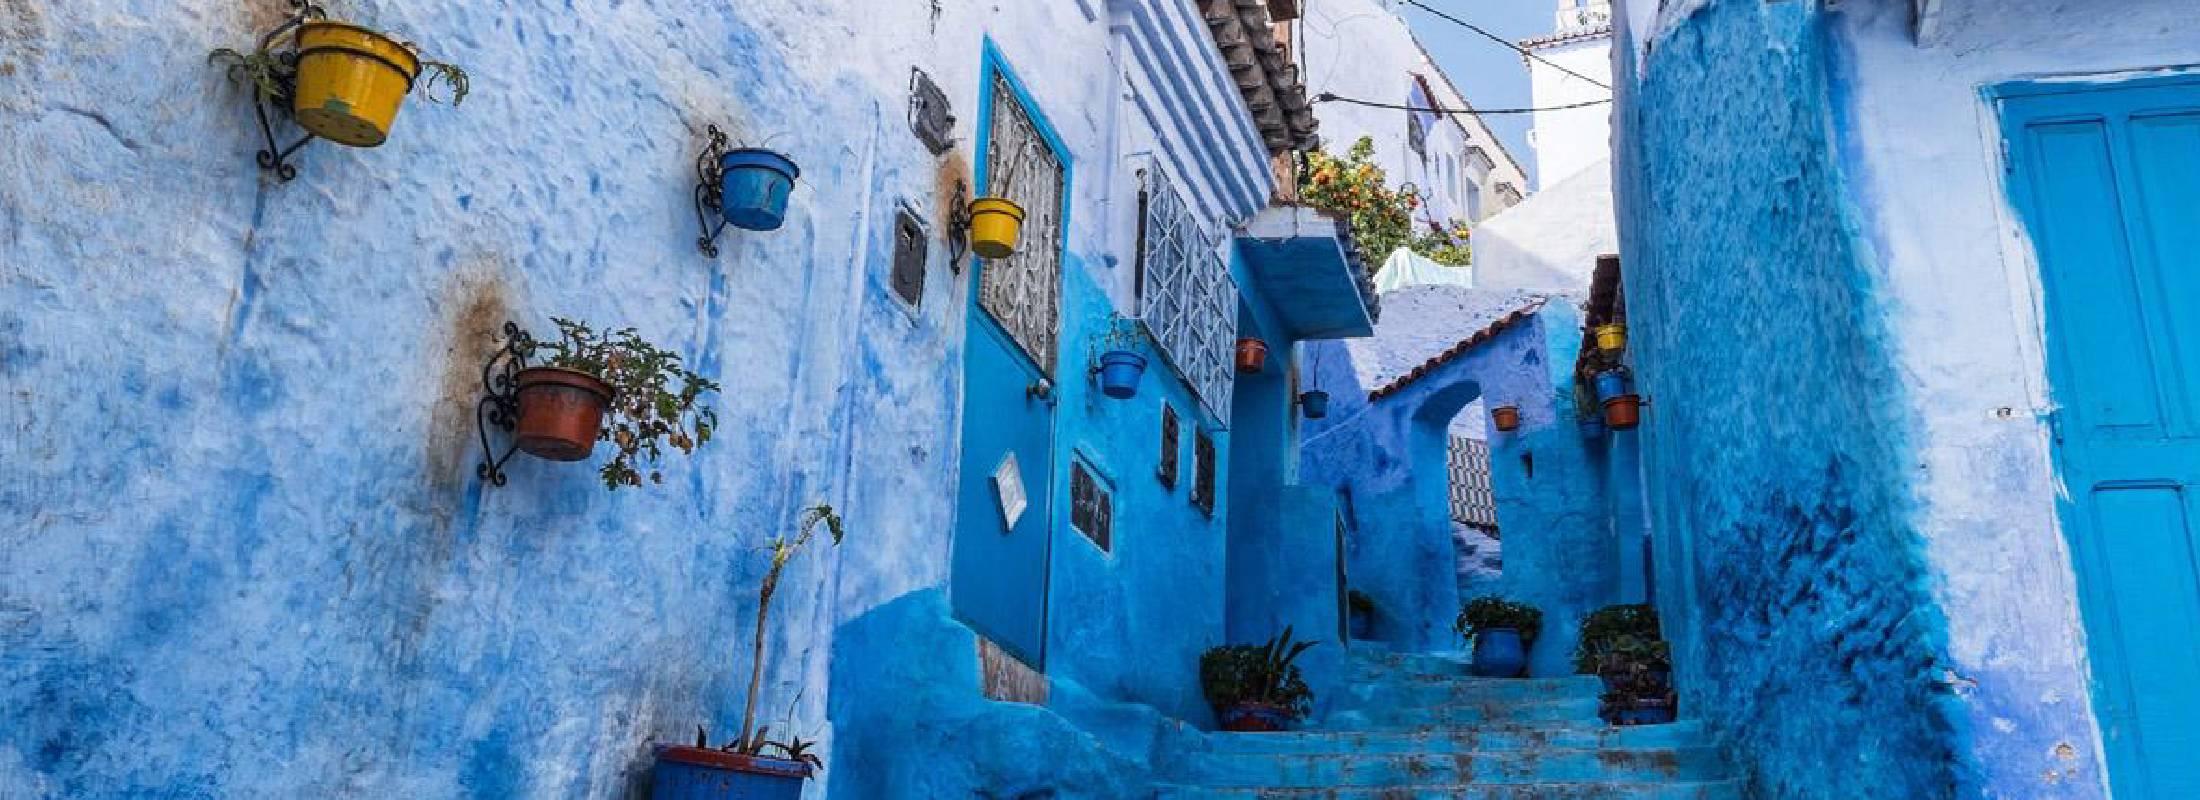 Calles de Xaune, Marruecos